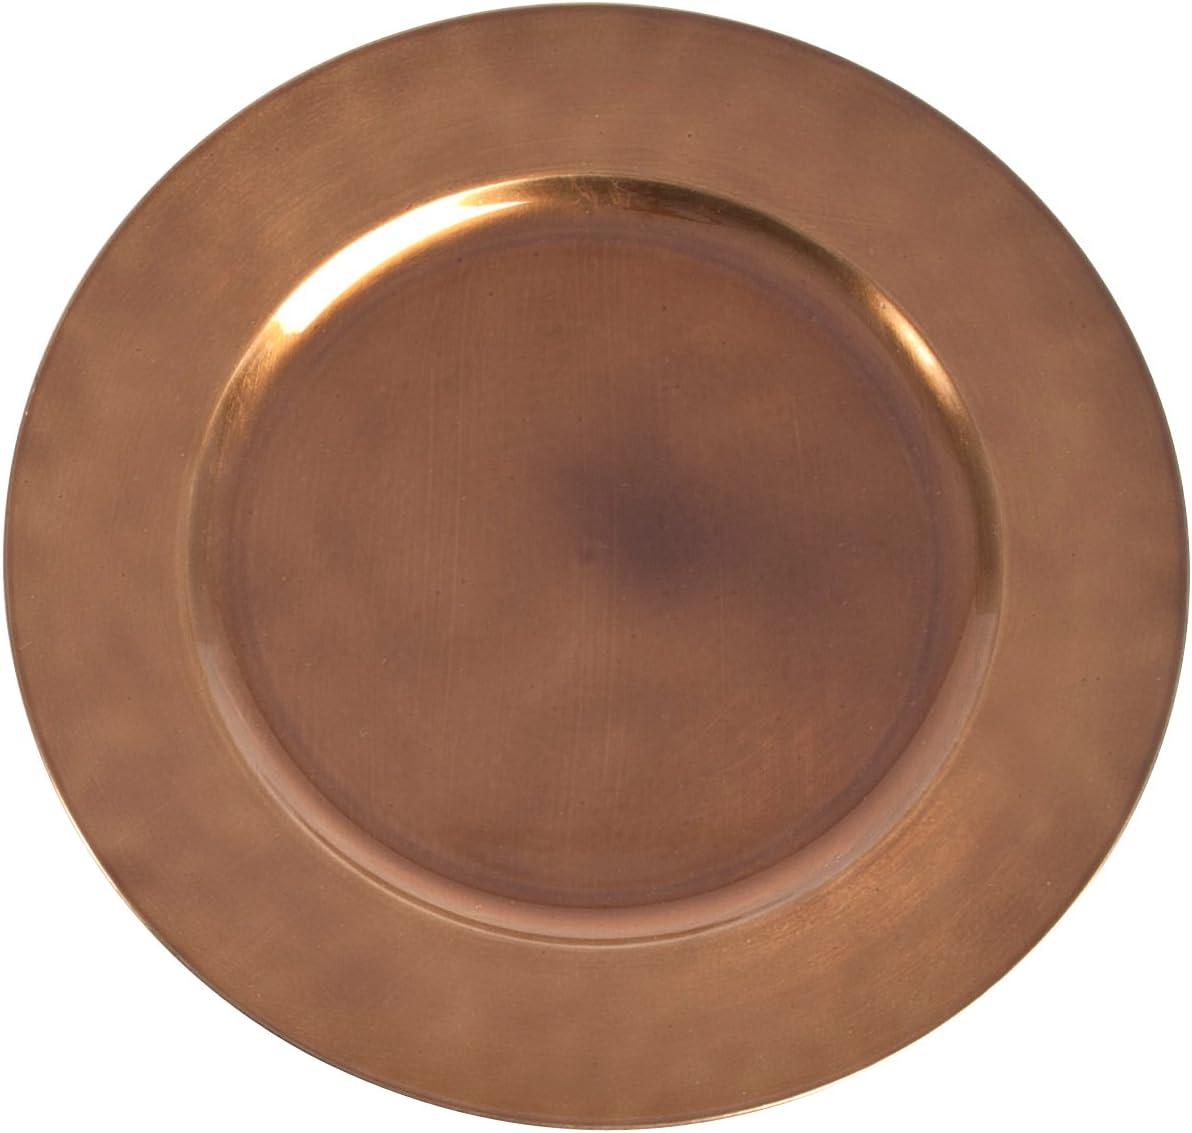 SARO LIFESTYLE Couleurs du Monde Collection Classic Design Charger Plate, 13